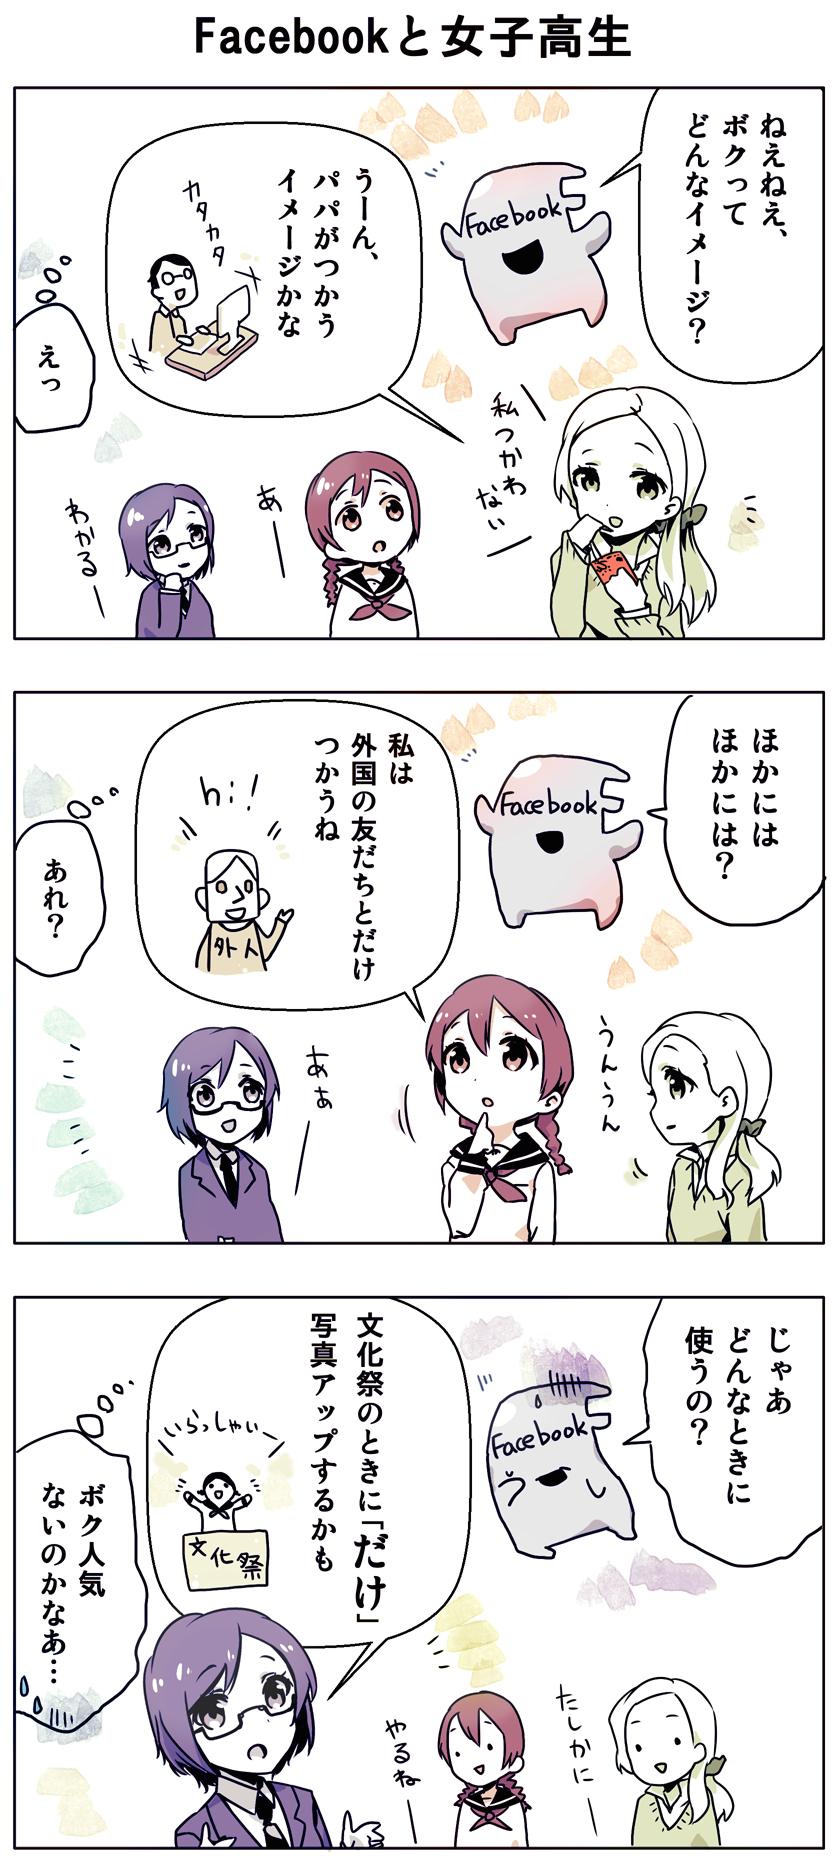 harajuku201503_manga_facebook